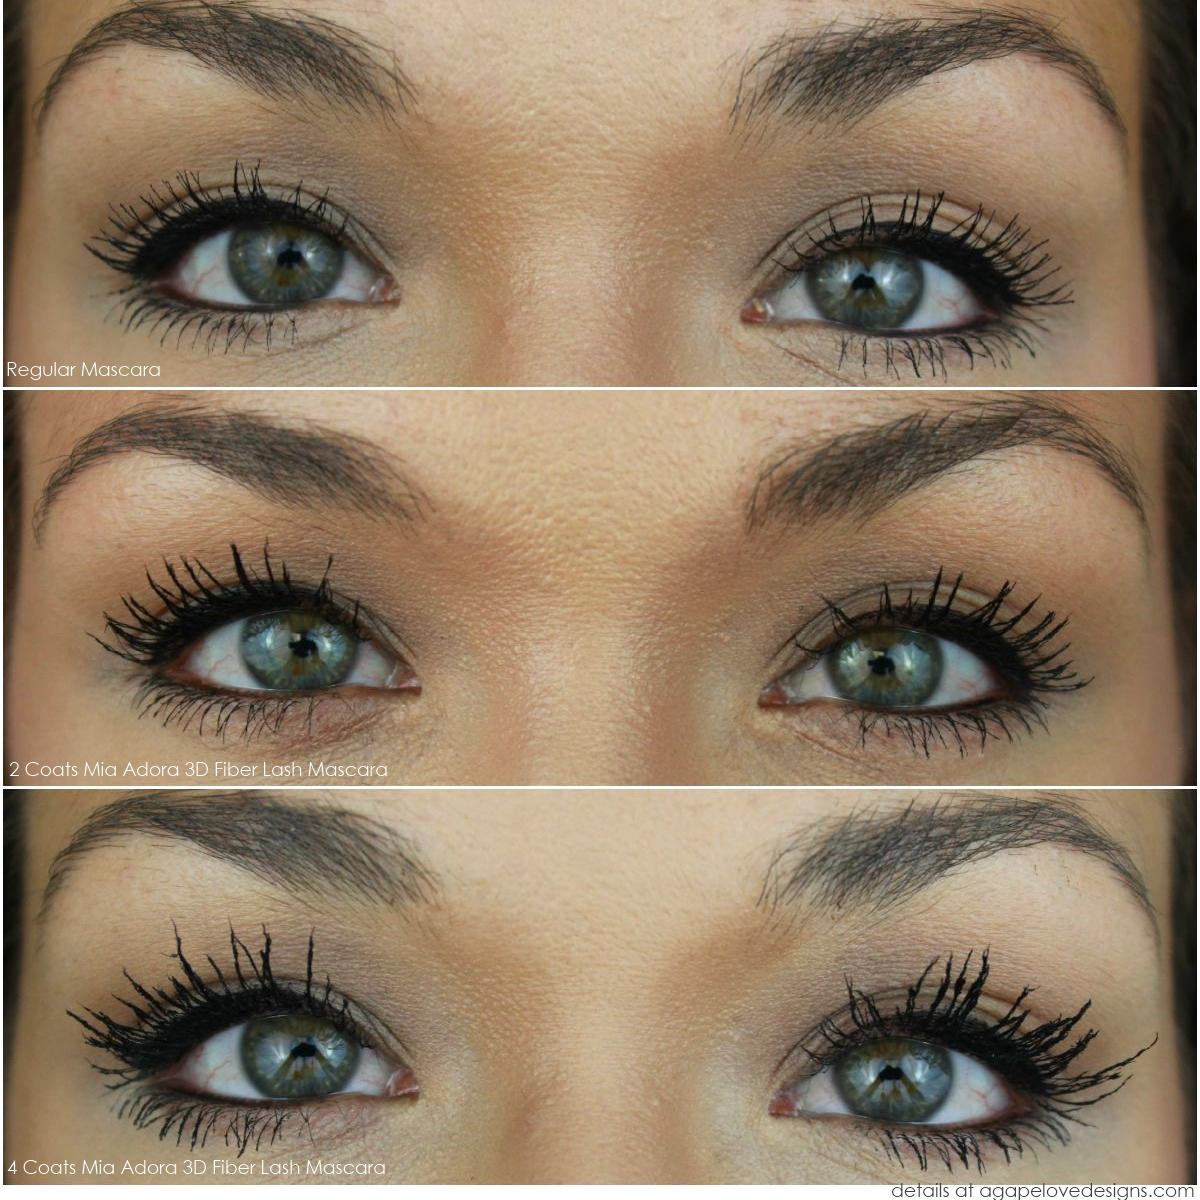 7c02d83377c Fiber Lash Mascara Creates Long Eyelashes. 74 likes. Natural mineral based  cosmetics and new las lengthening Fiber Lash Mascara made from Green Tea.